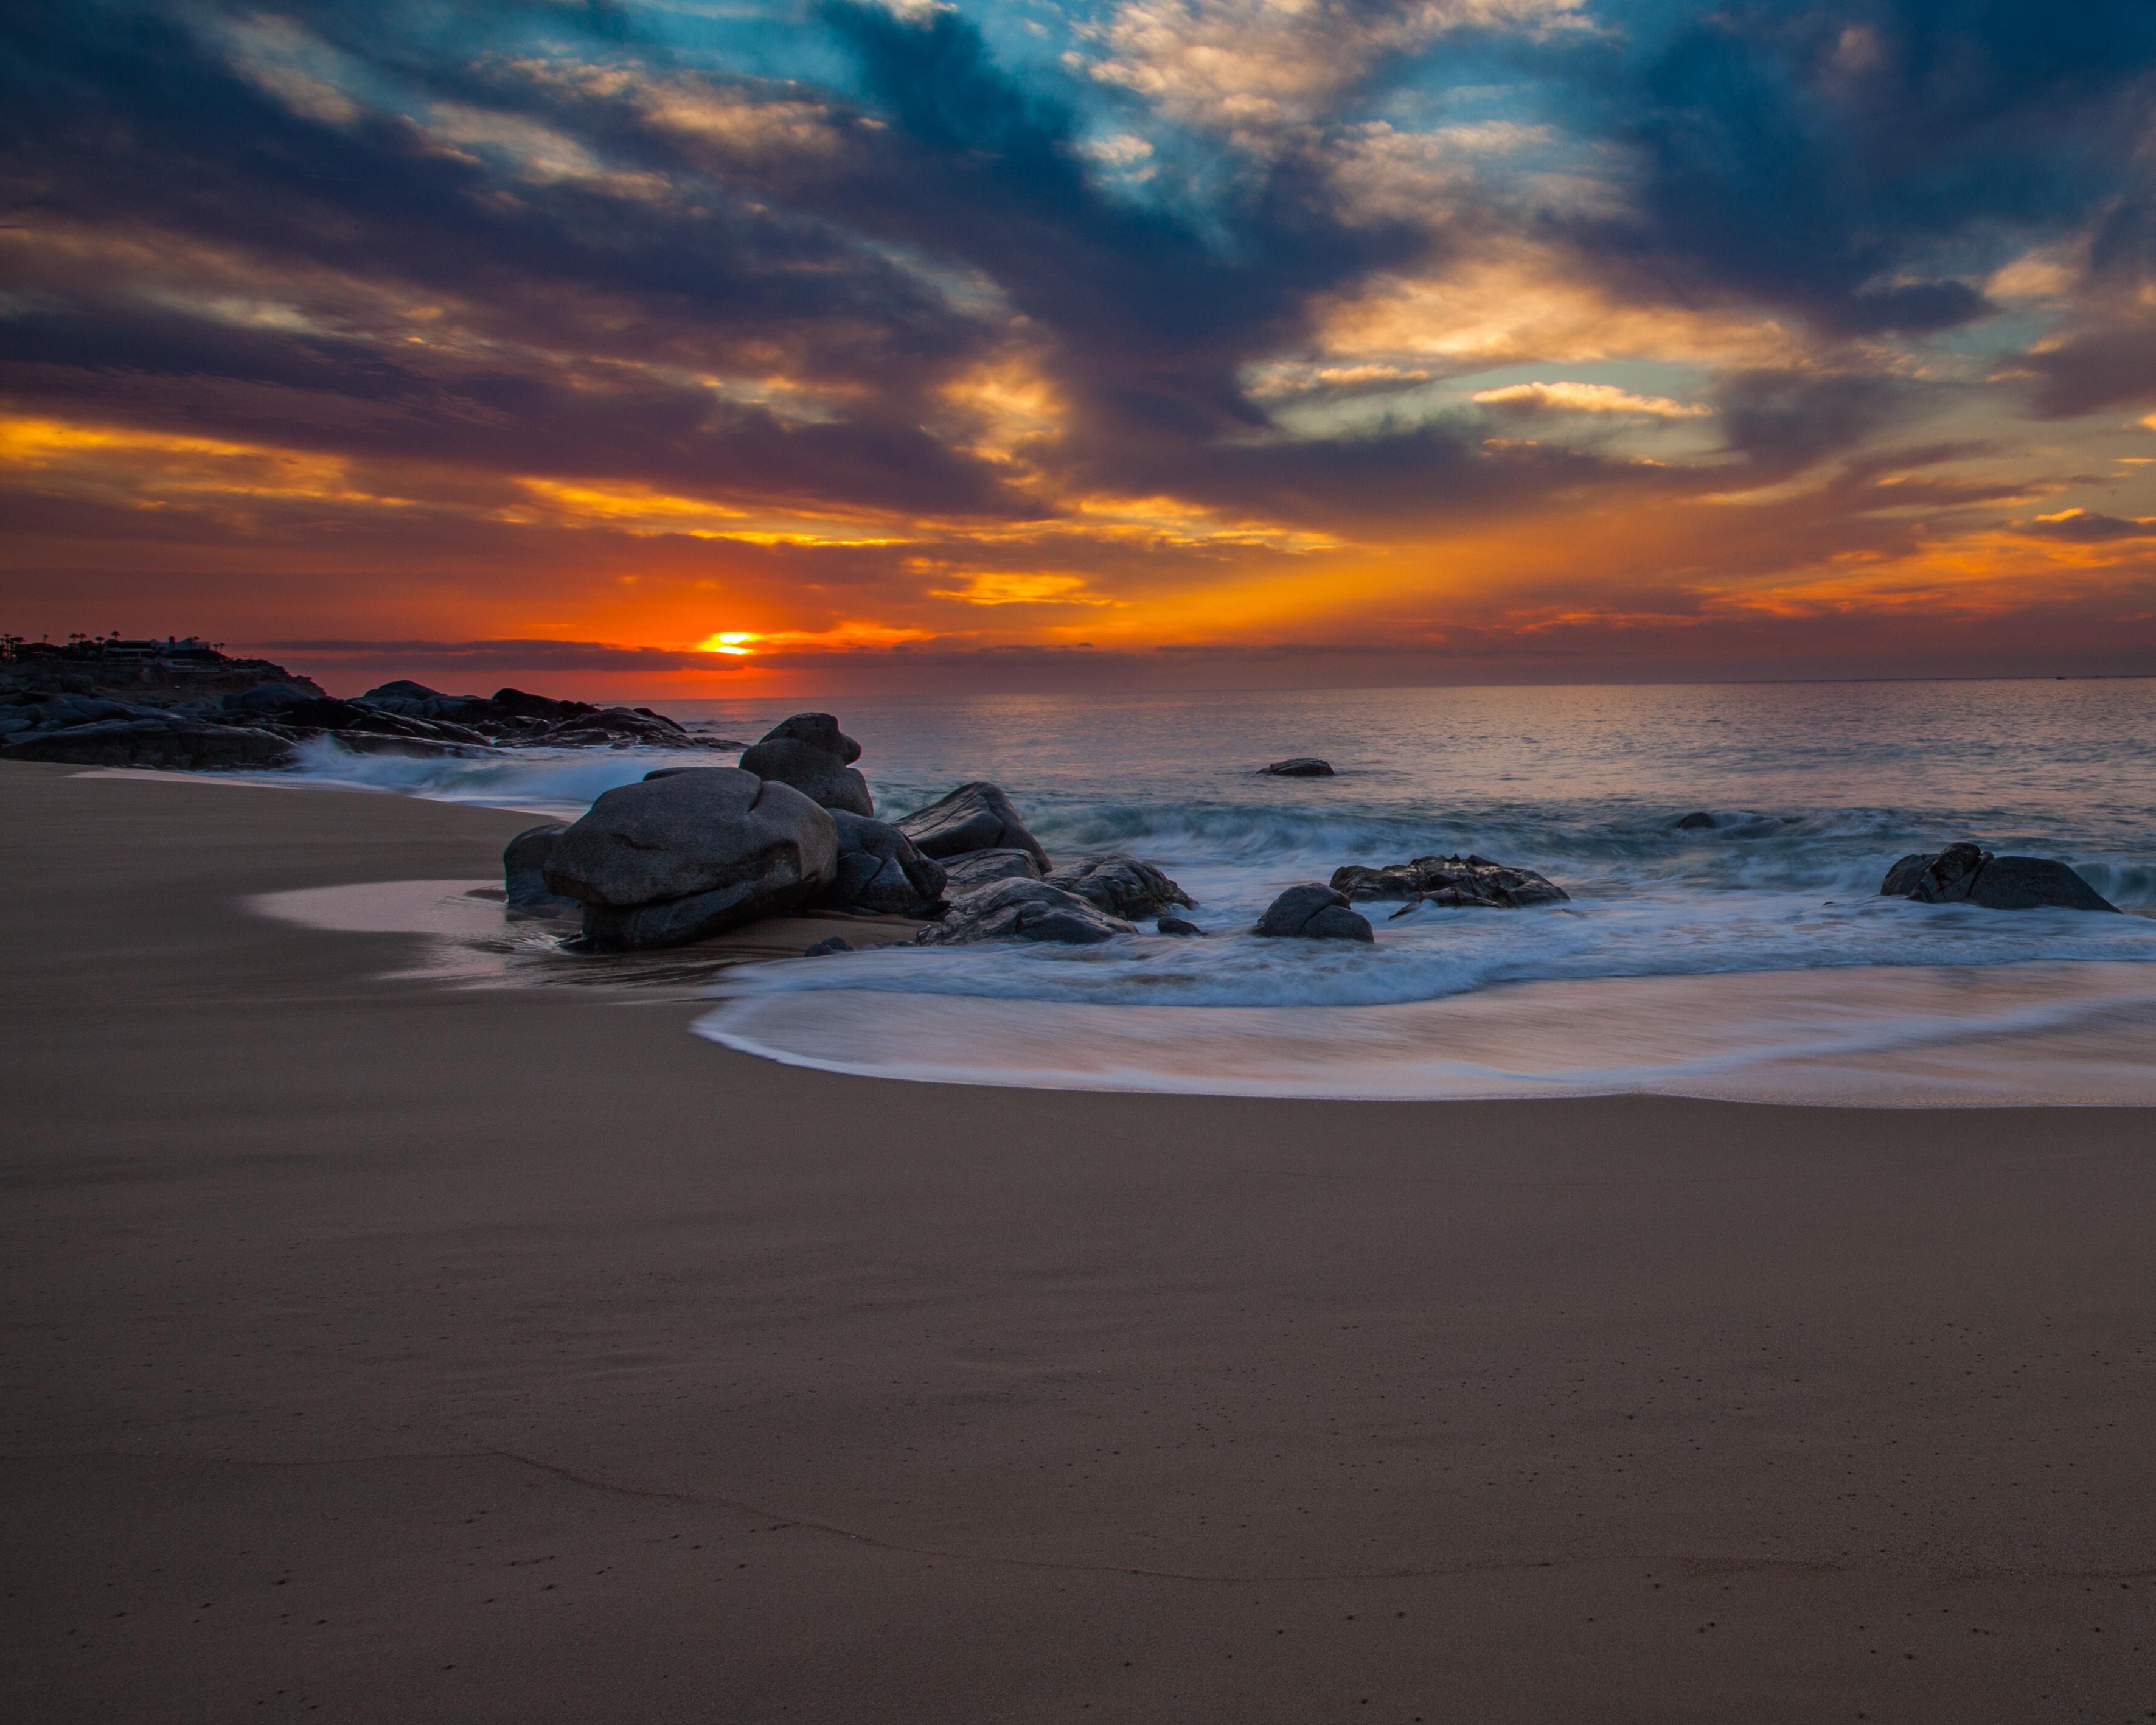 Sunrise, Cabo San Lucas, Mexico